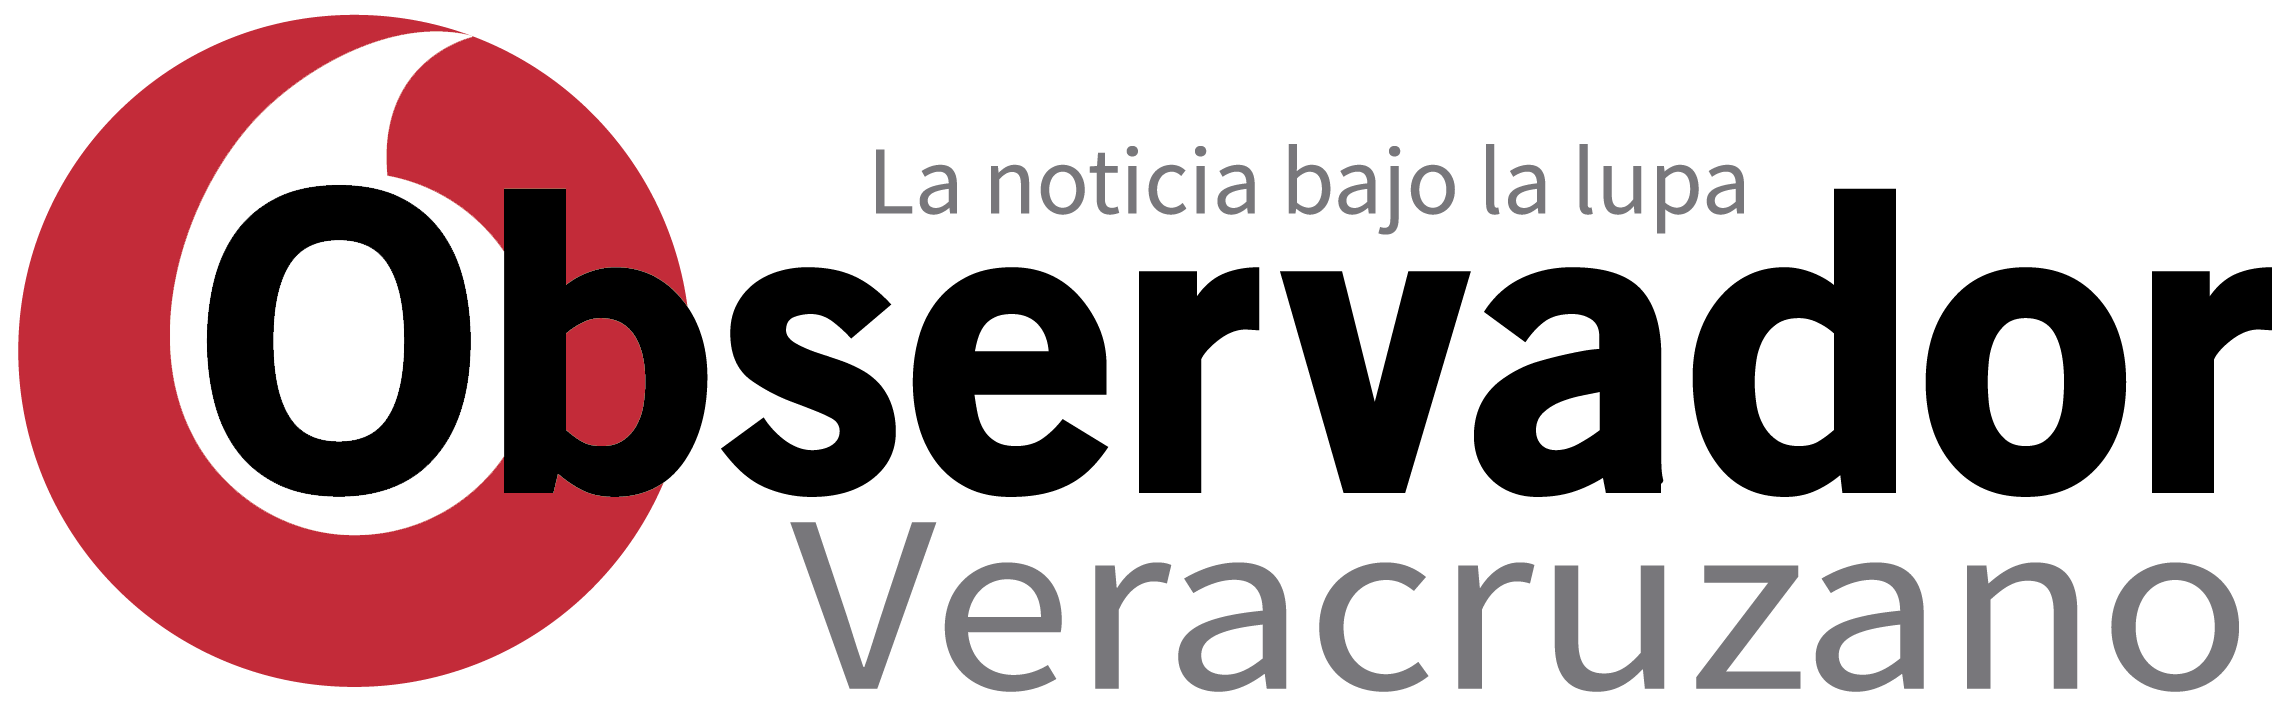 Observador Veracruzano